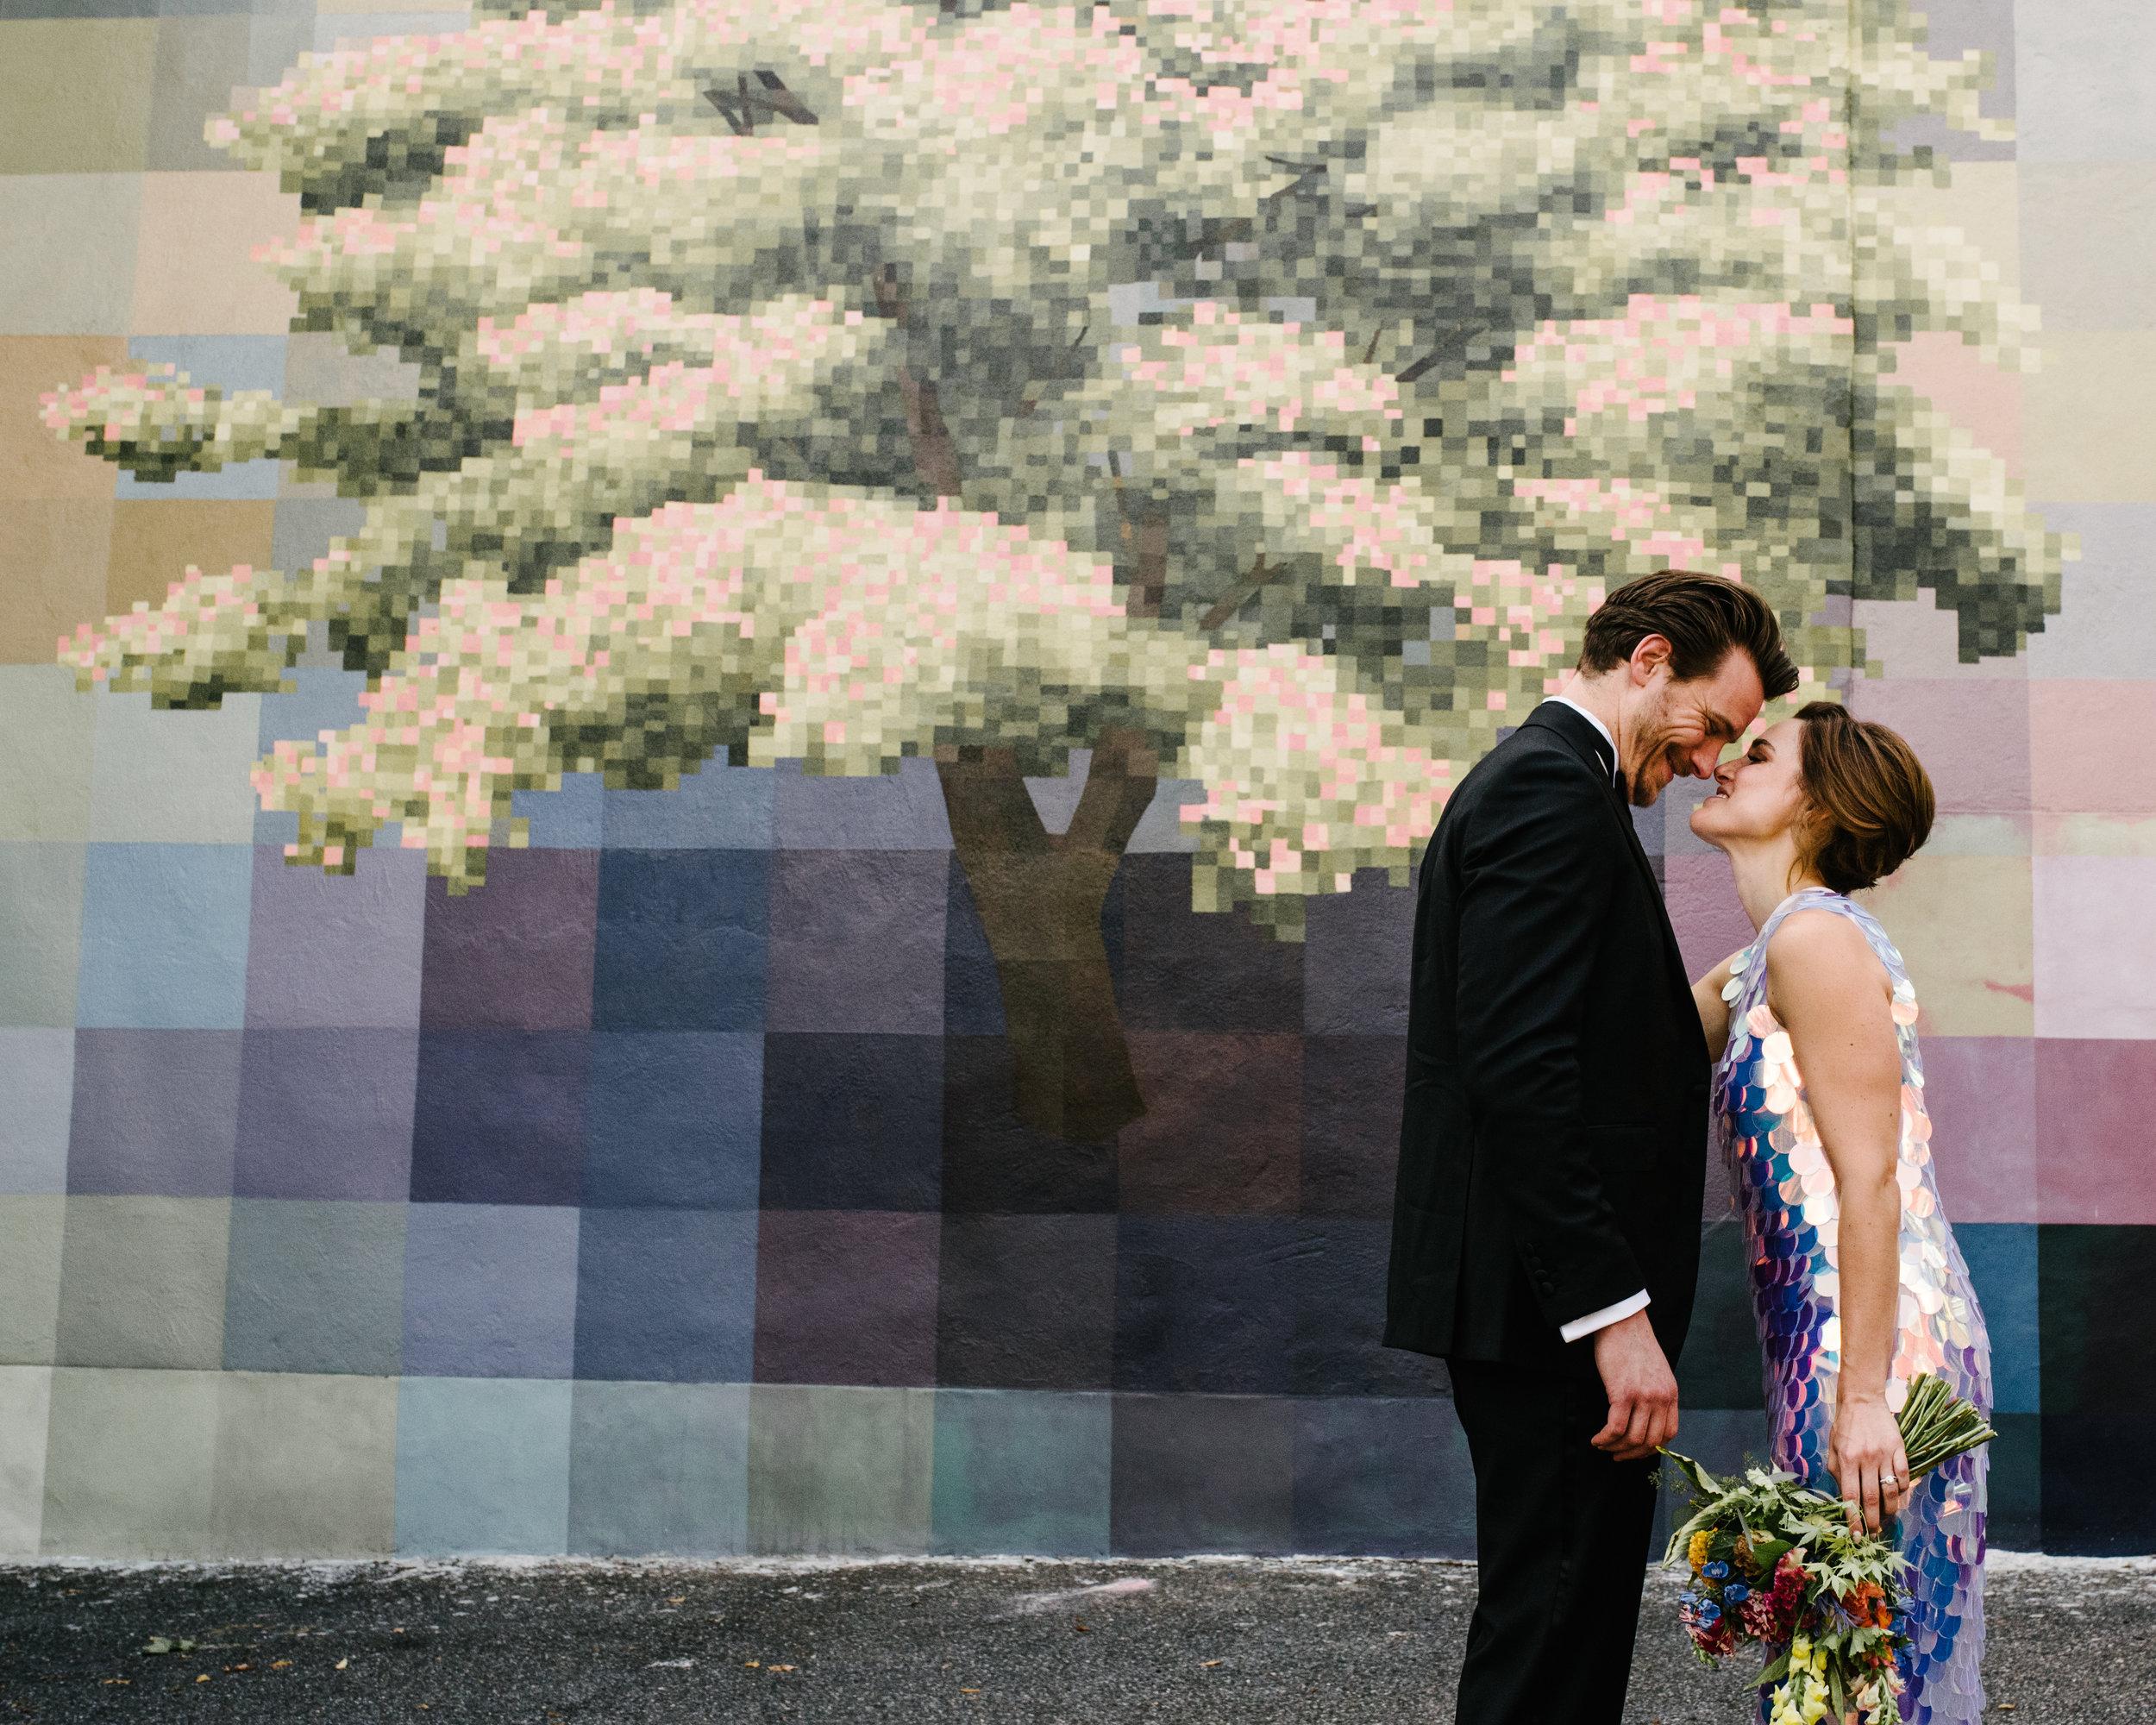 agpcollective_wedding_vernick-4787.jpg